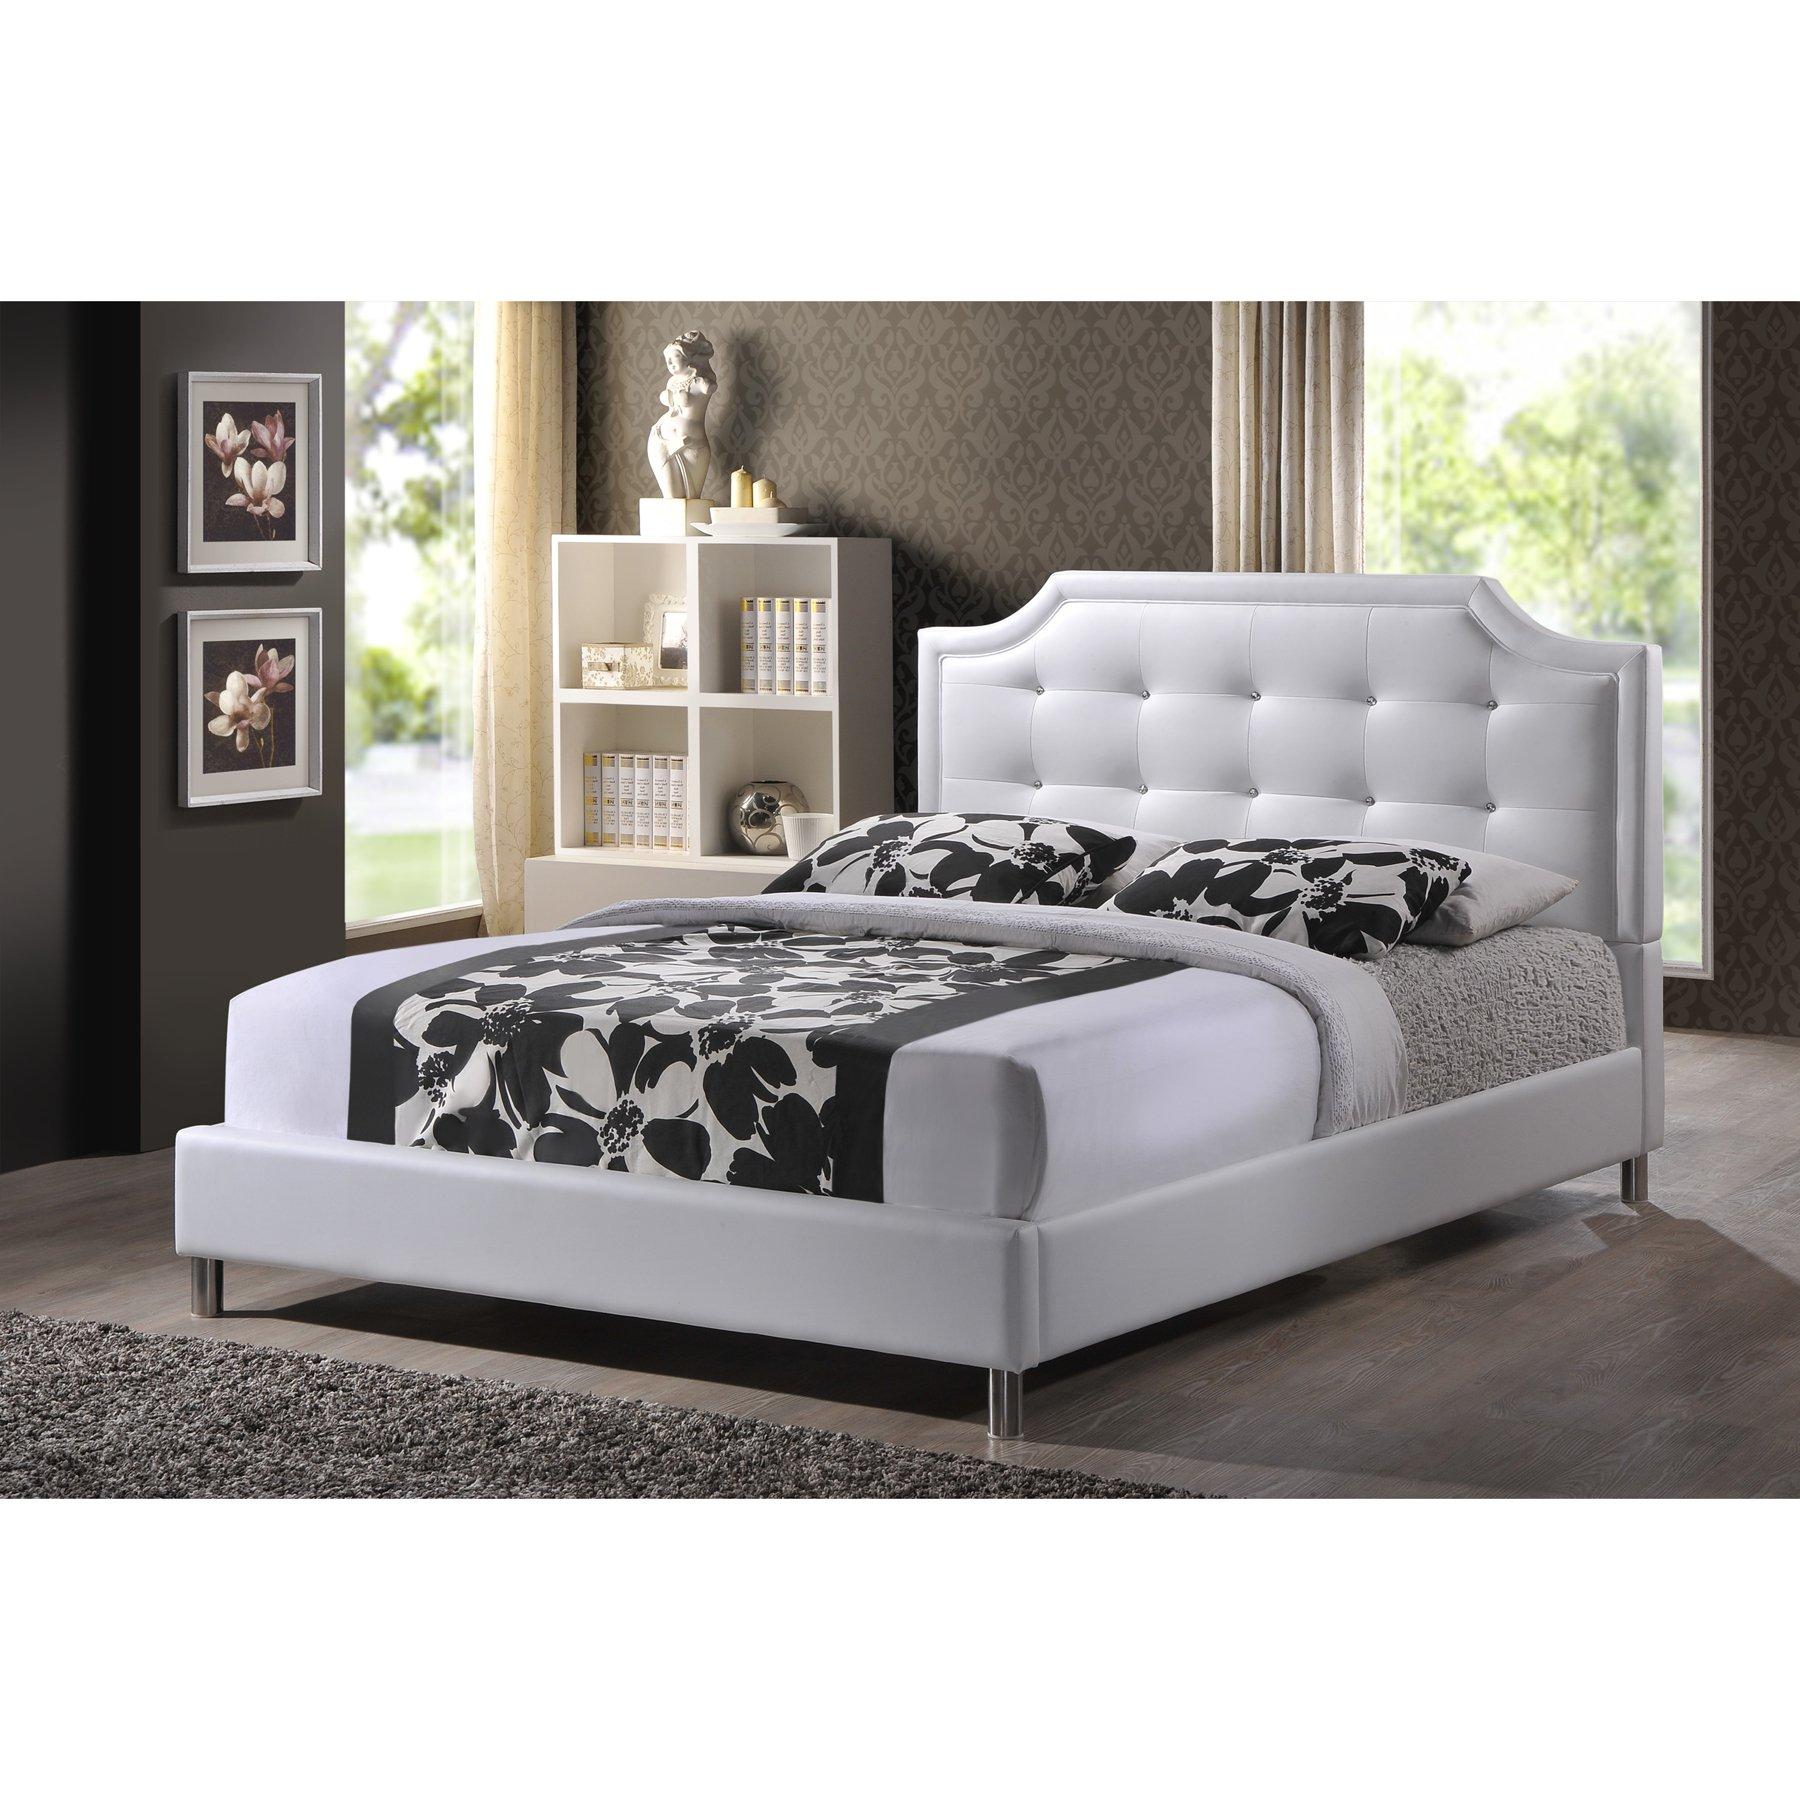 Baxton Studio Carlotta Modern Bed with Upholstered Headboard, White, 47.5'' x 63.58'' x 88.6'' by Baxton Studio